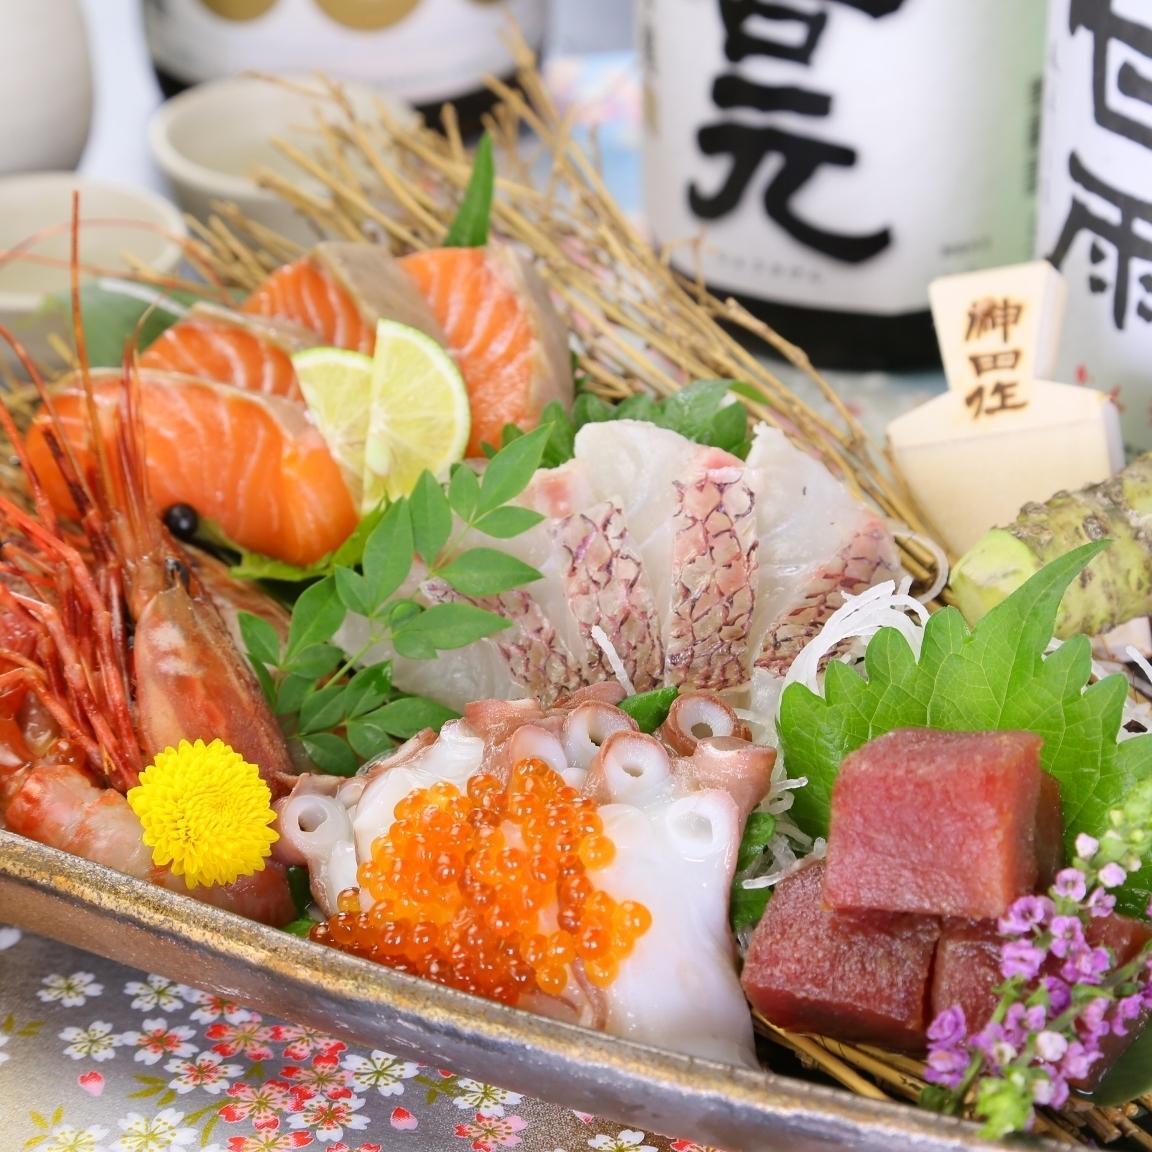 Popular private room izakaya just around Kyobashi Station ★ Luxuriously bring fresh seafood!